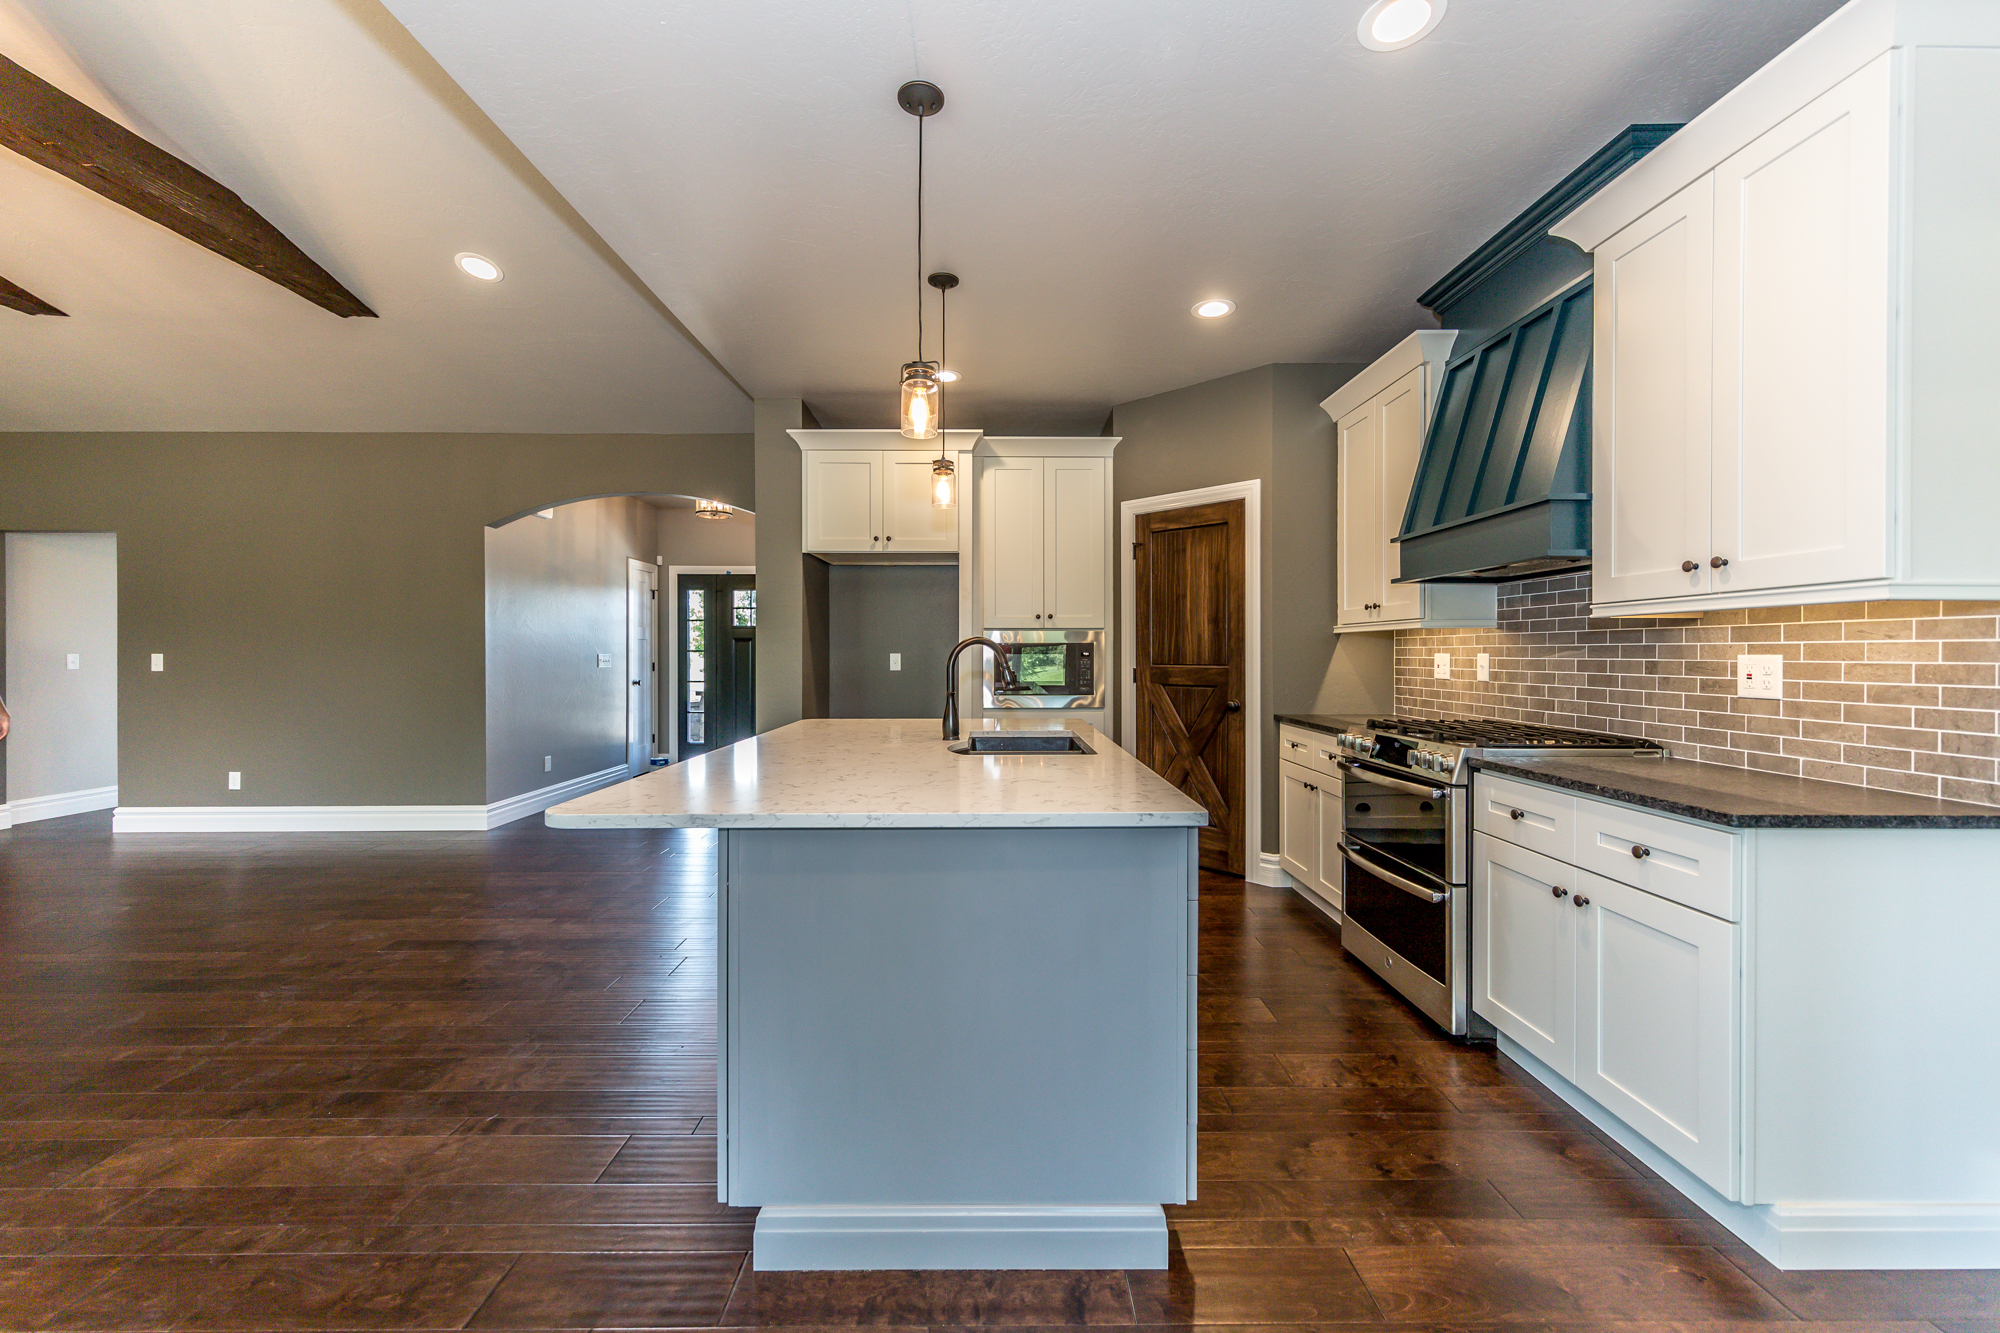 Home_For_Sale_O'Fallon_Illinois_Scott_AFB_CR_Holland-7.jpg